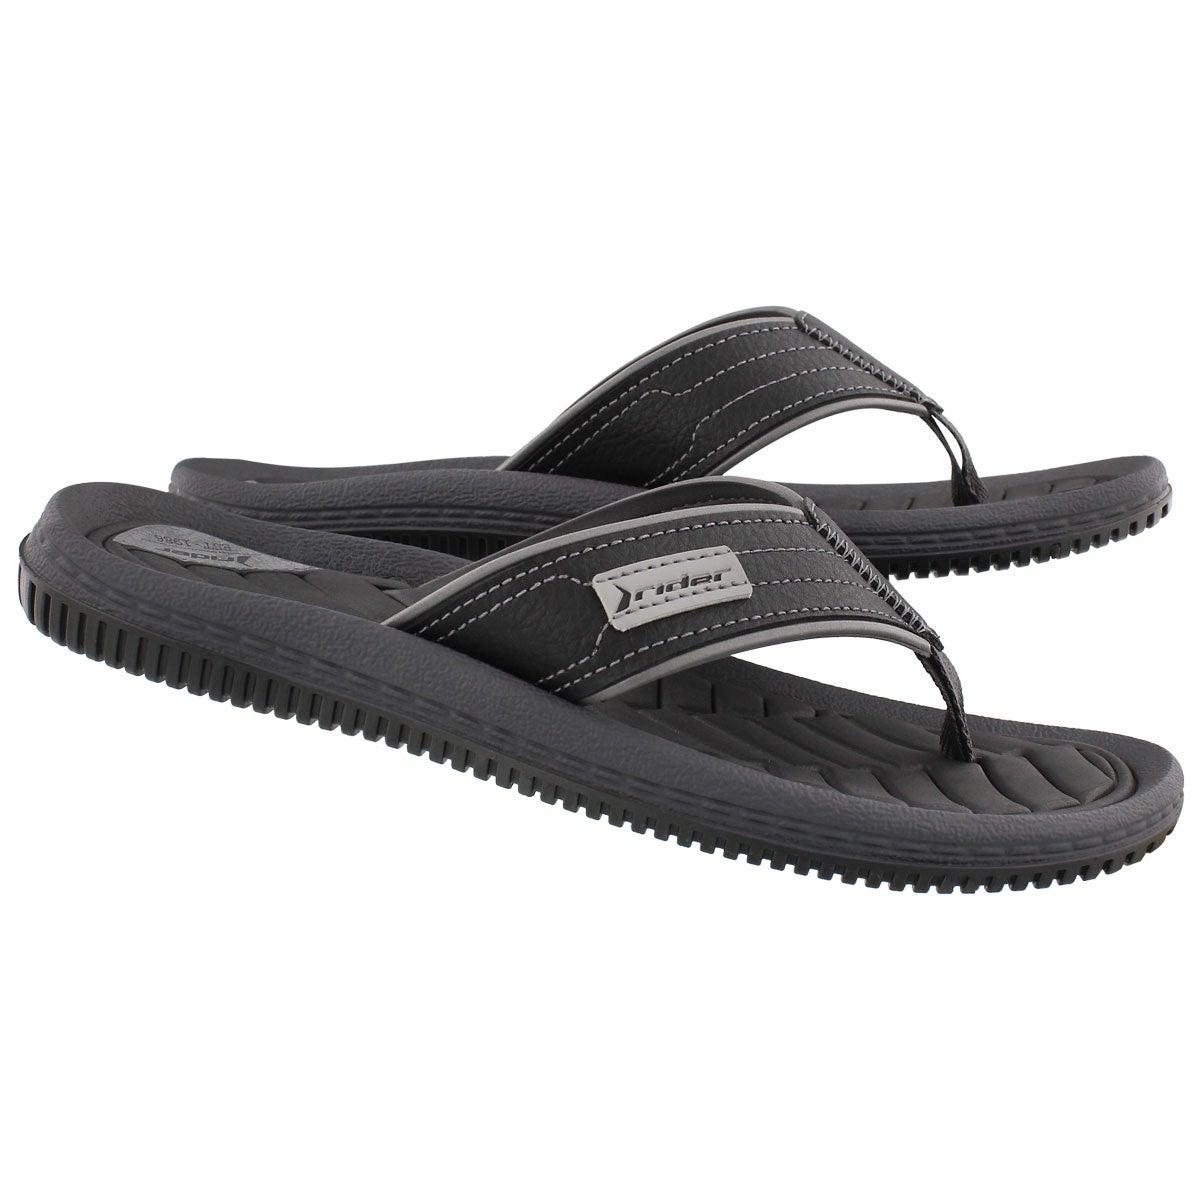 Mns Dunas XIII blk/blk thong sandal